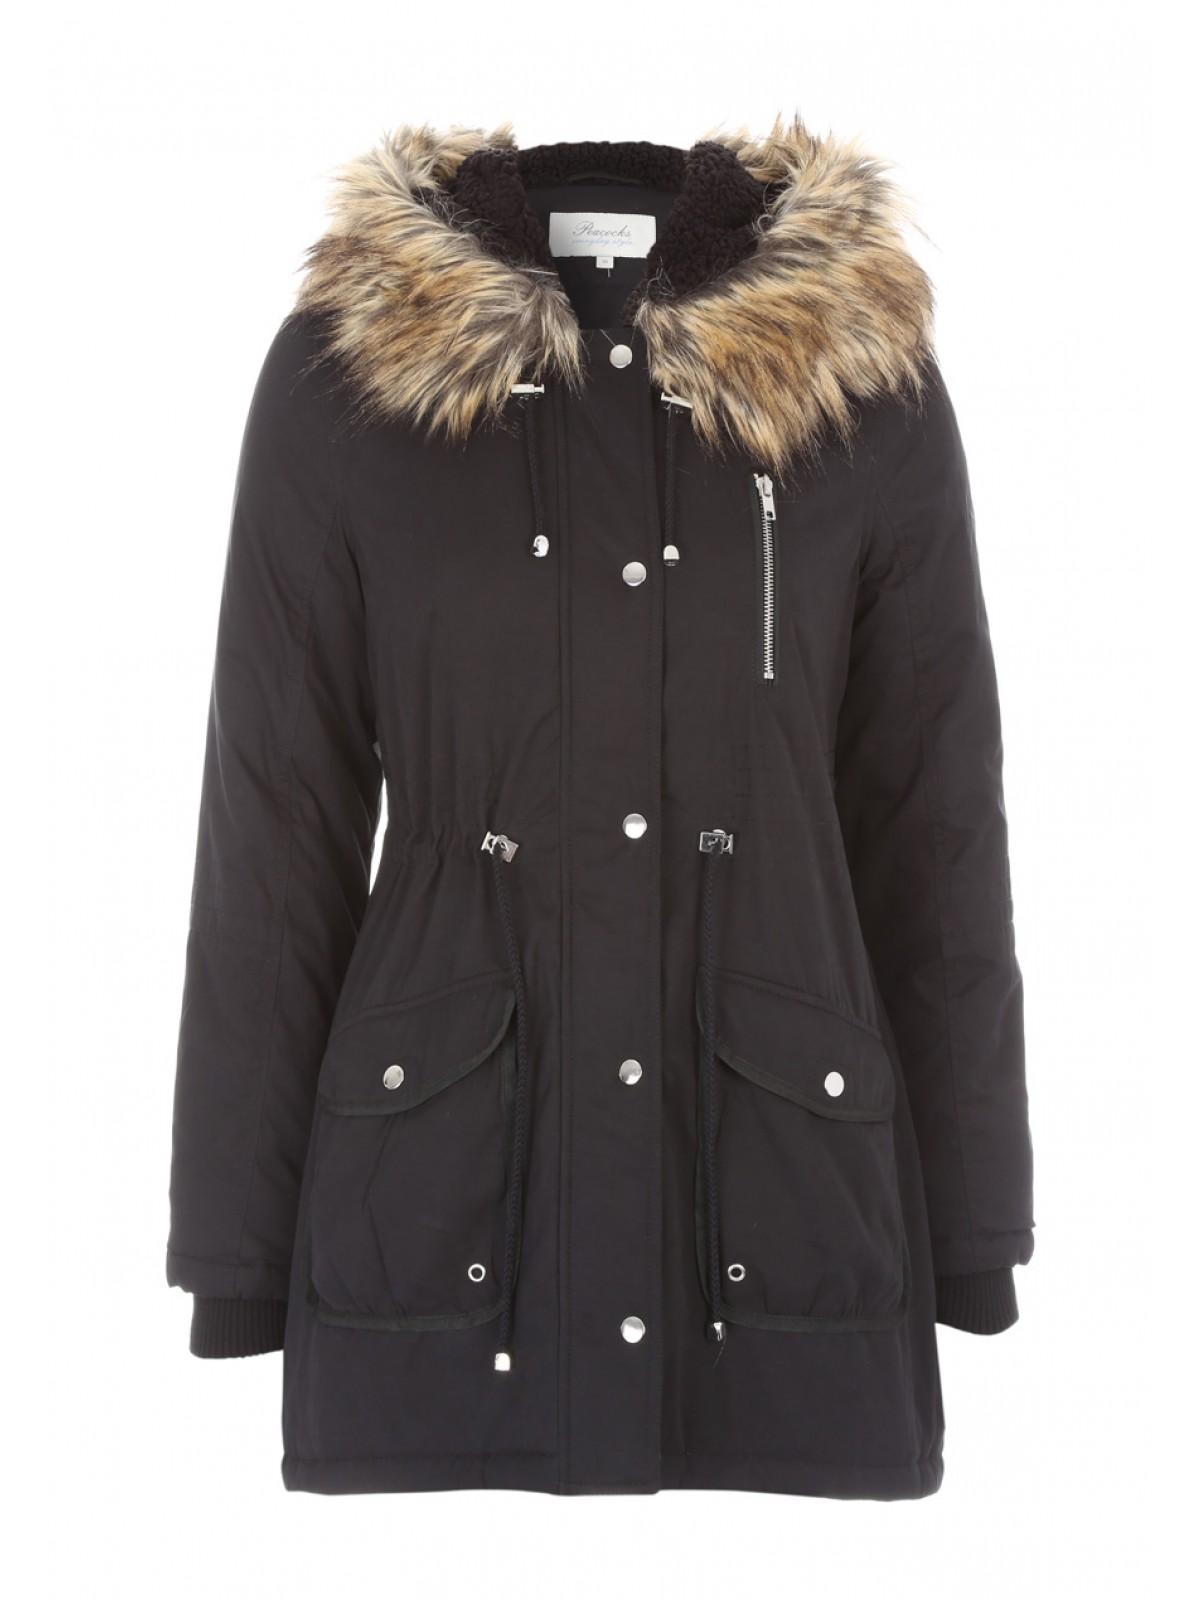 Womens Faux Fur Hood Parka Coat | Peacocks